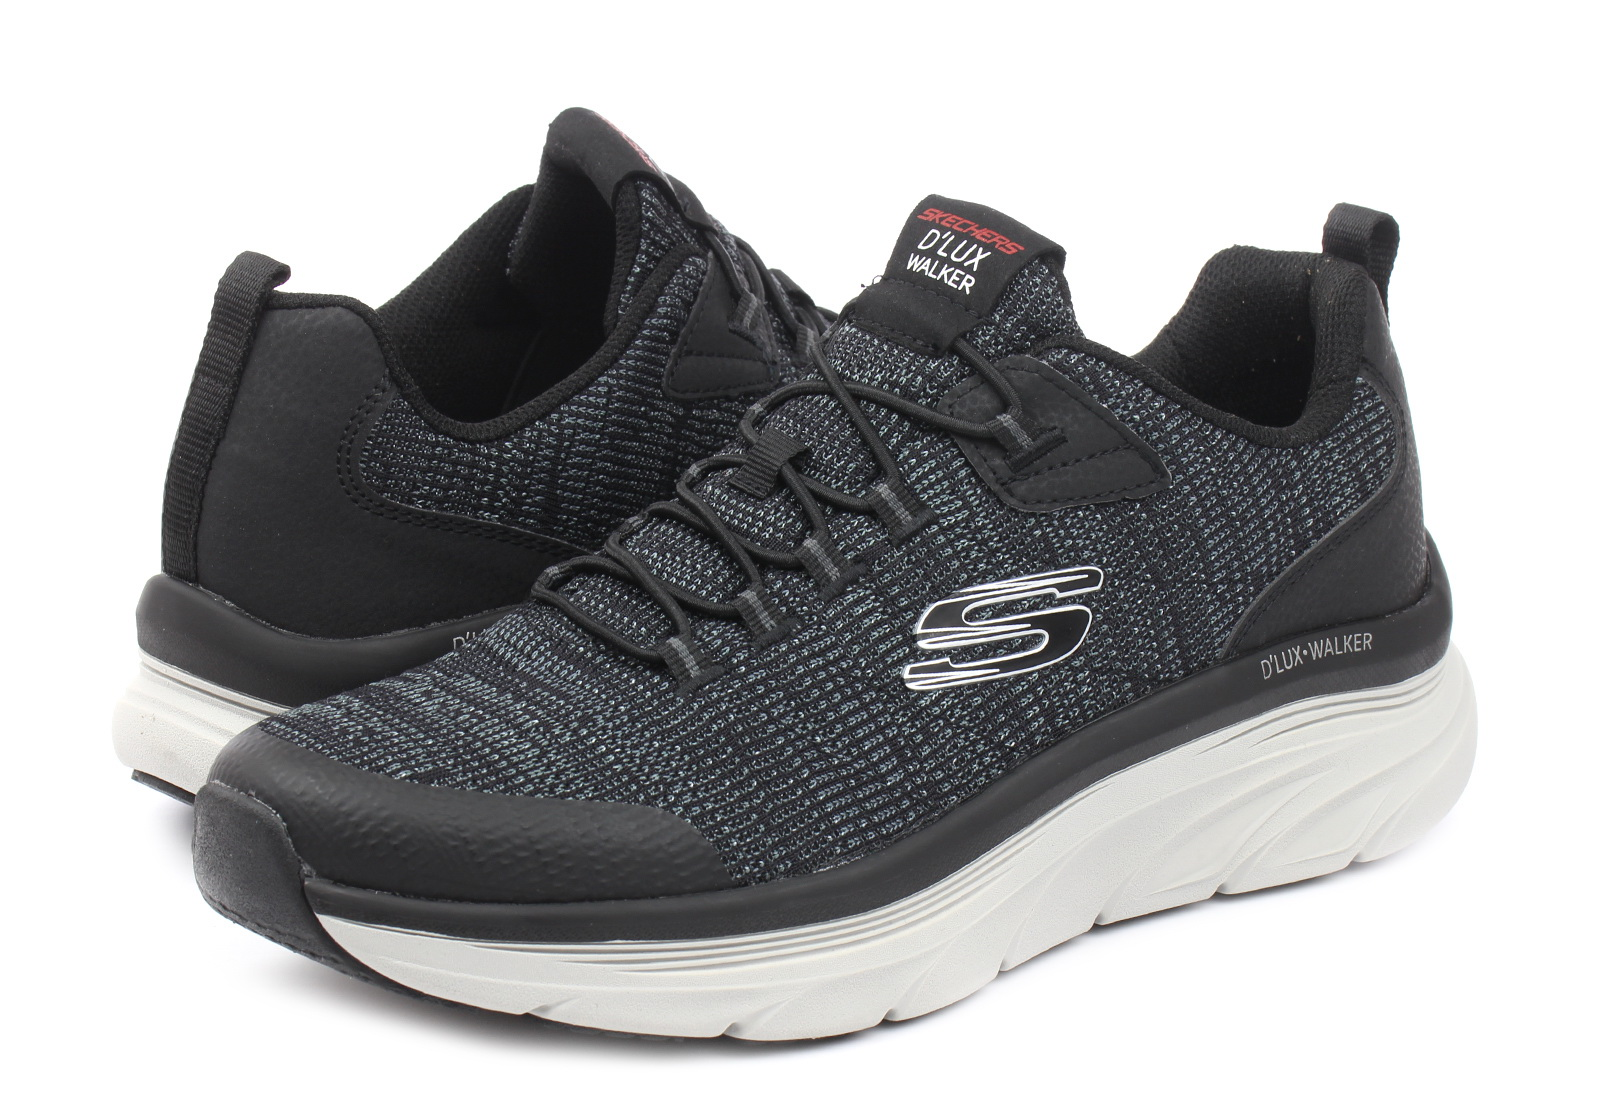 Skechers Pantofi Dlux Walker - Pensive